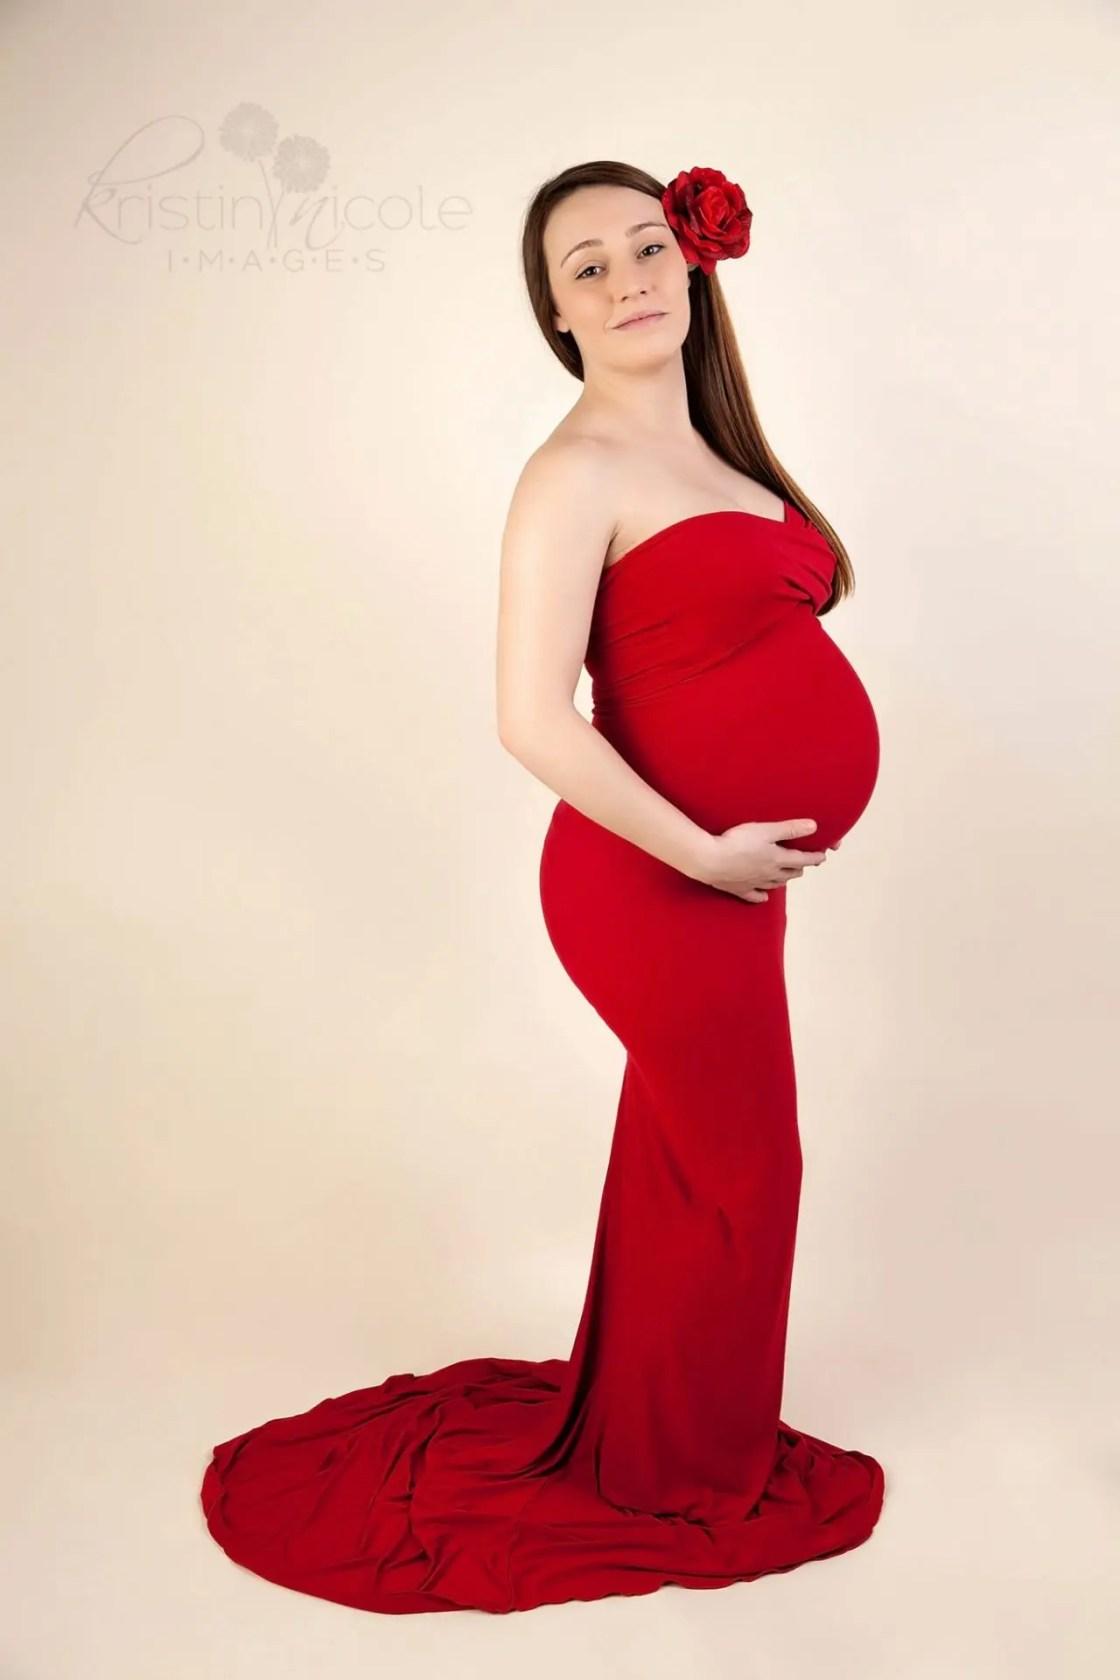 Salisbury MD Maternity Princess Photographer